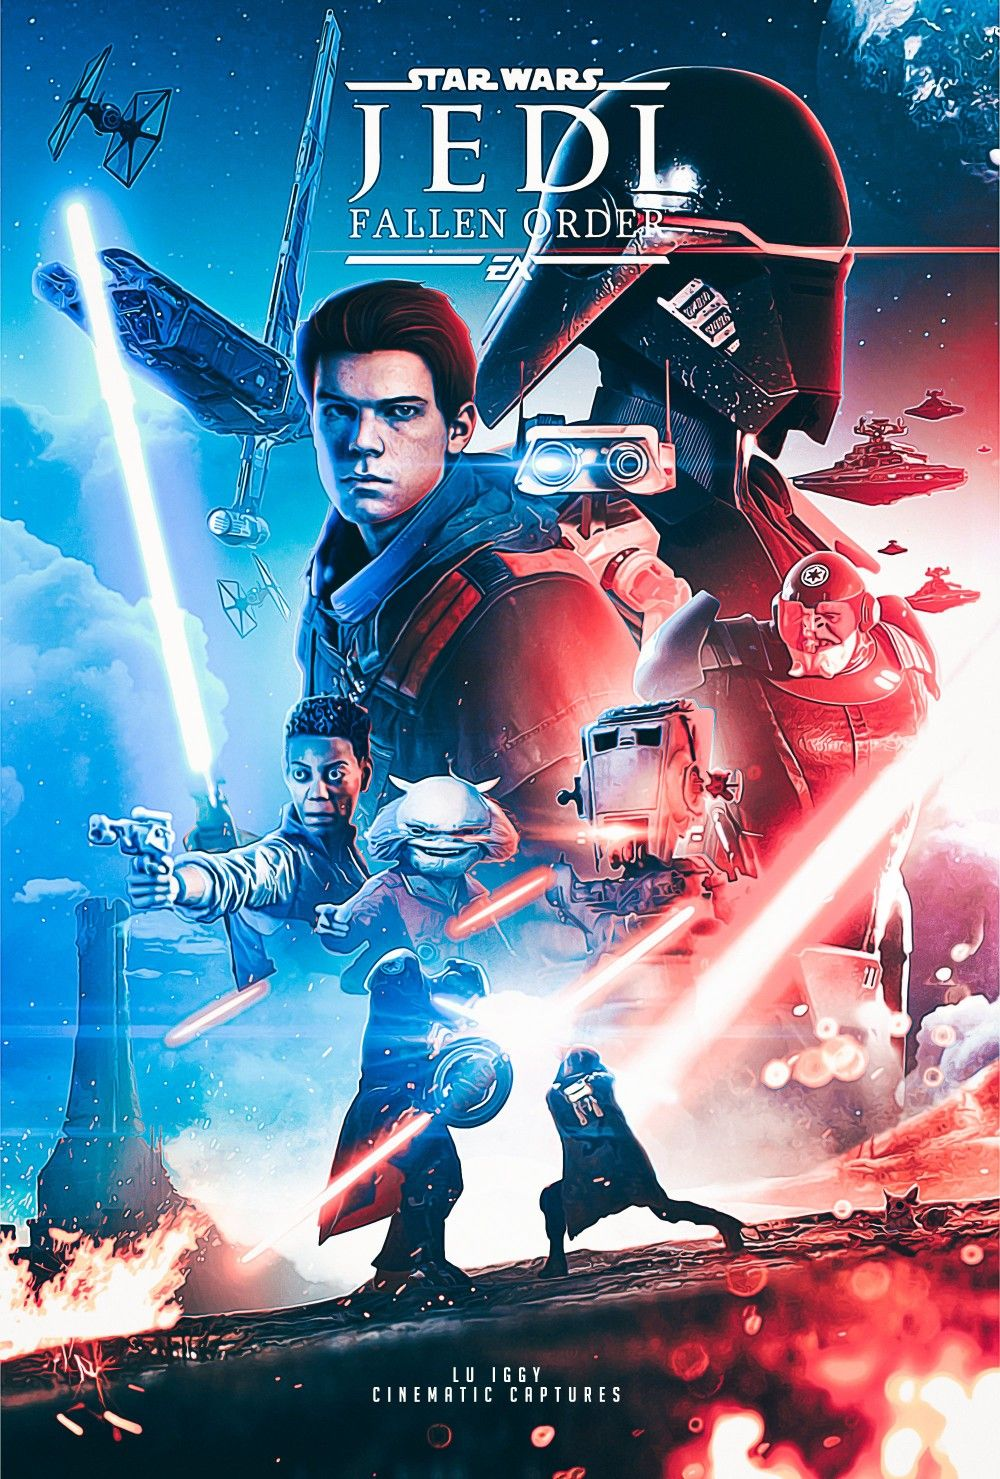 Star Wars Jedi Fallen Order Star Wars Movies Posters Star Wars Images Star Wars Jedi Fallen Order